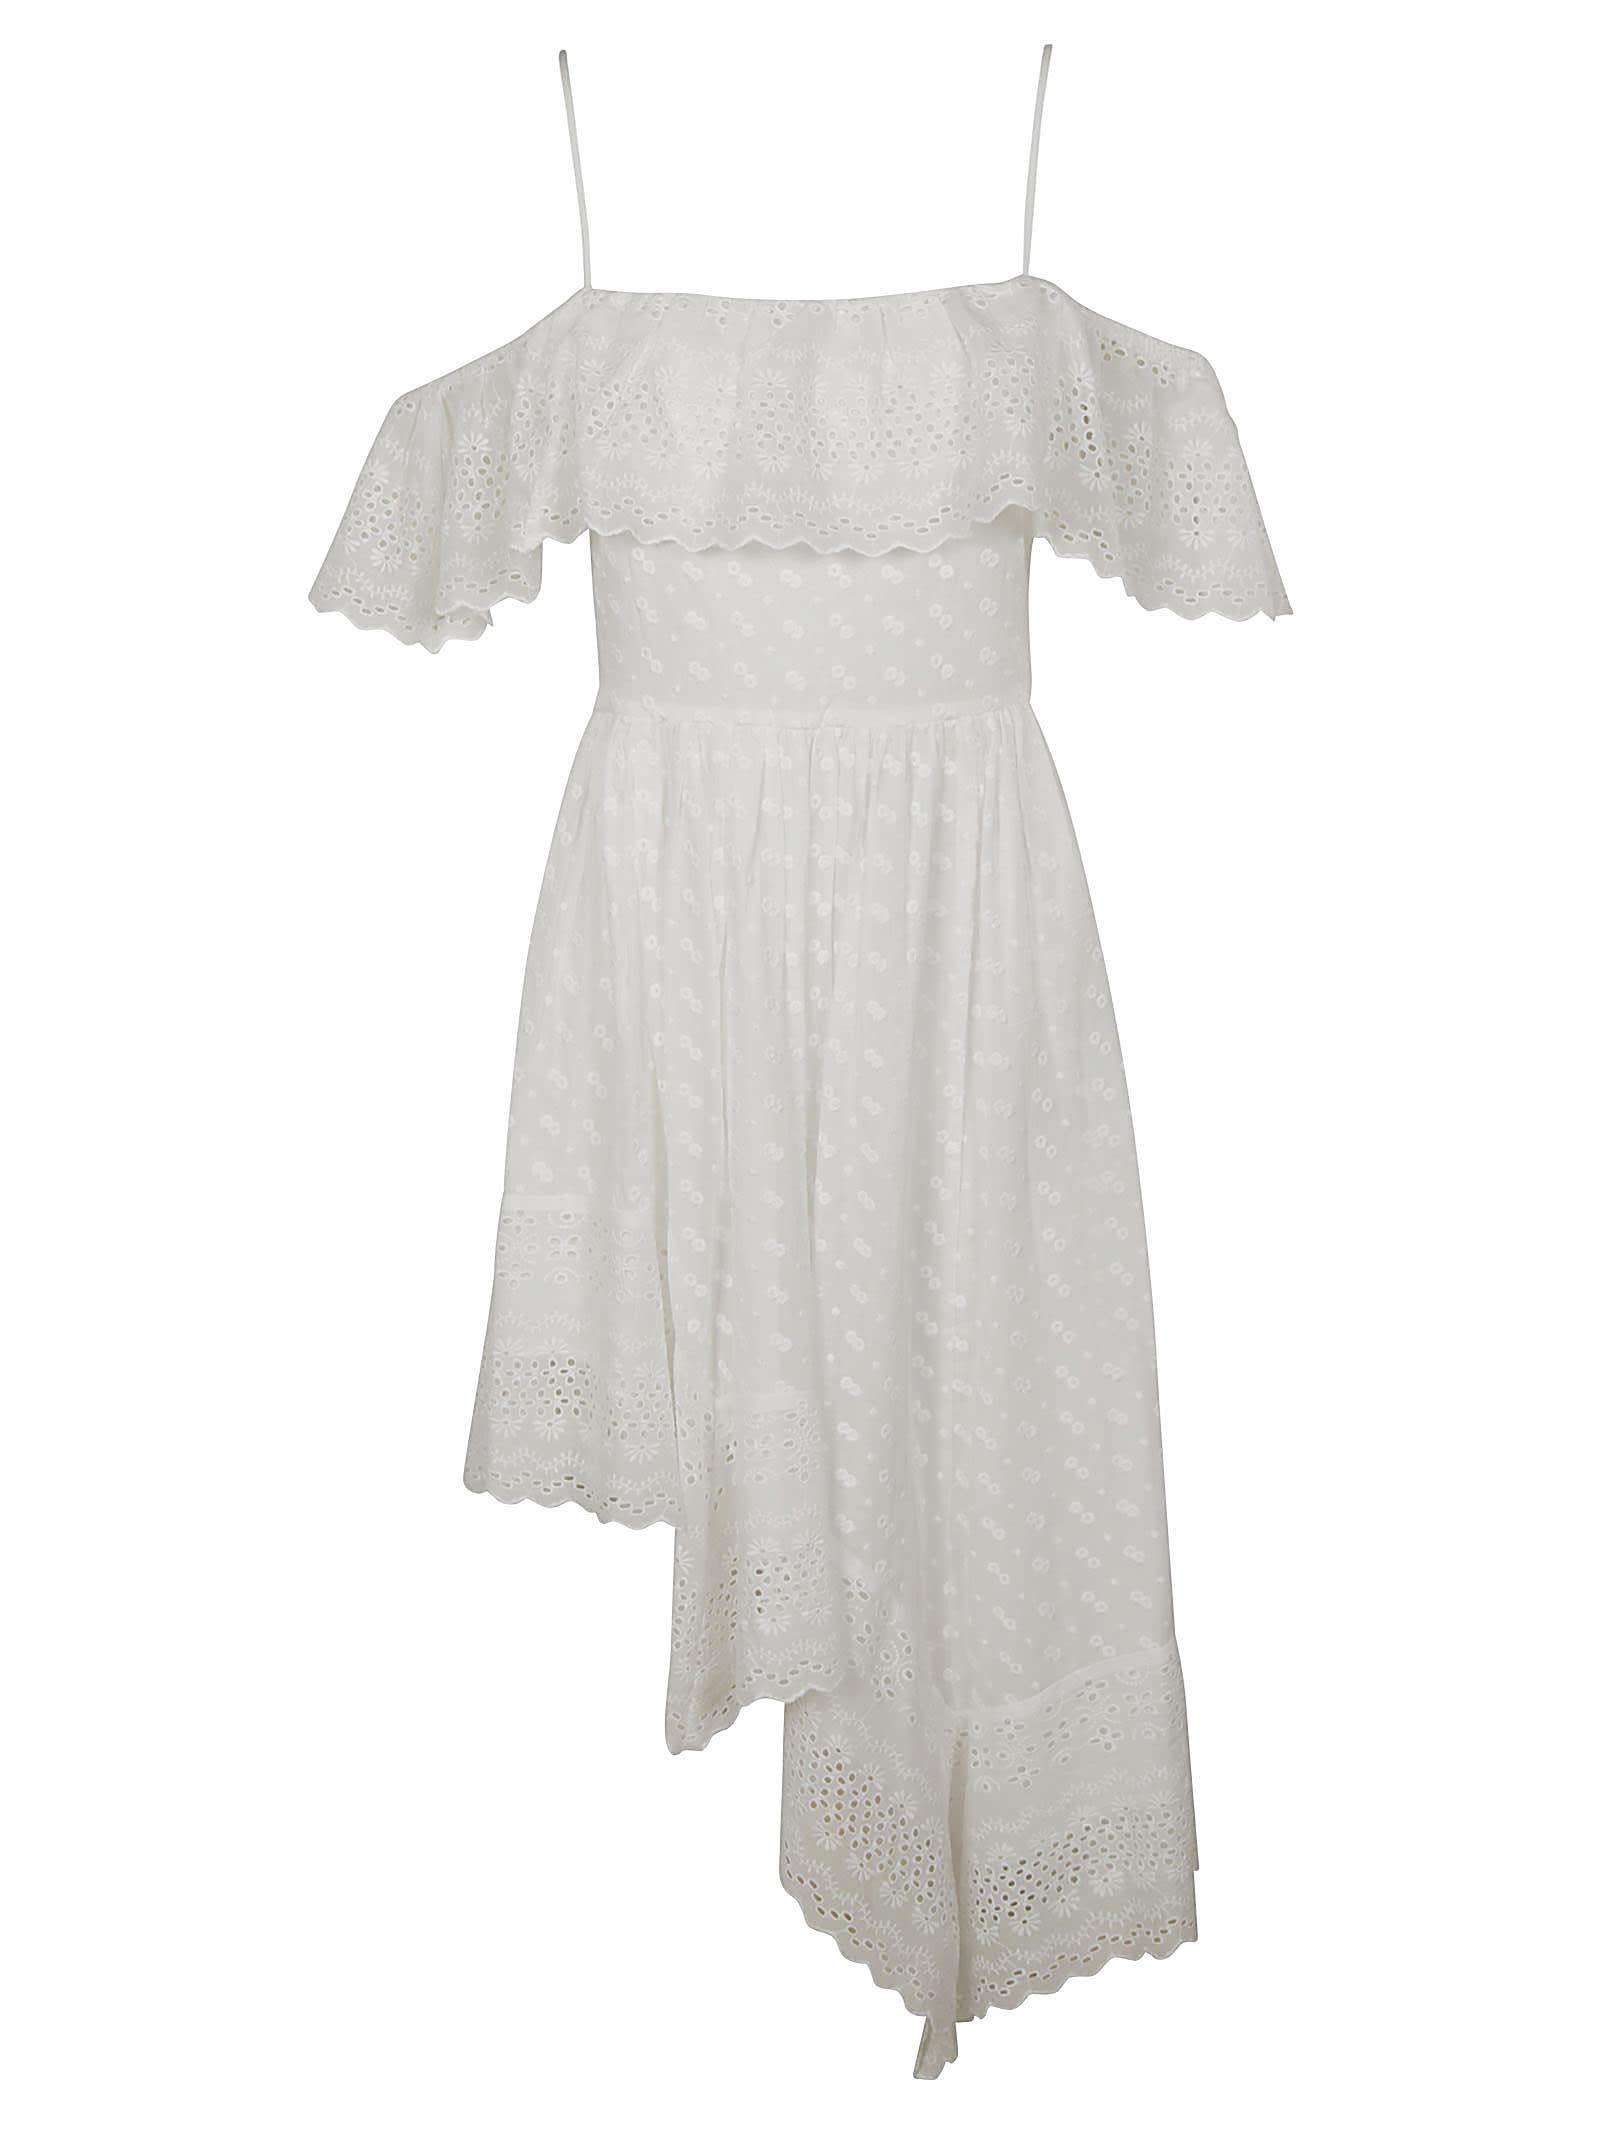 Isabel Marant Timoria Dress